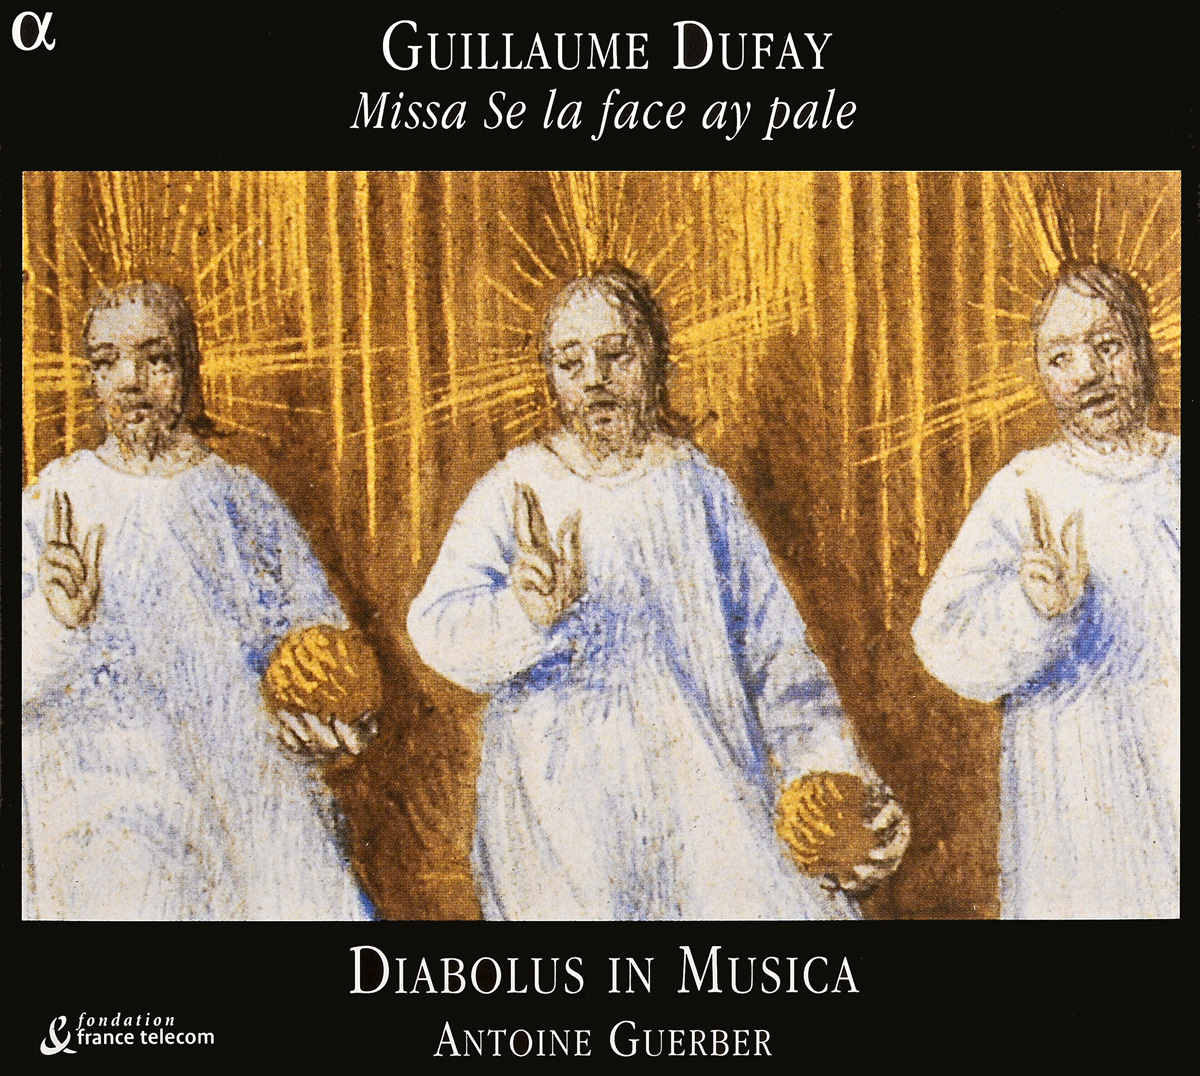 Guillaume Dufay - Diabolus In Musica, Antoine Guerber. Missa Se La Face Ay Pale